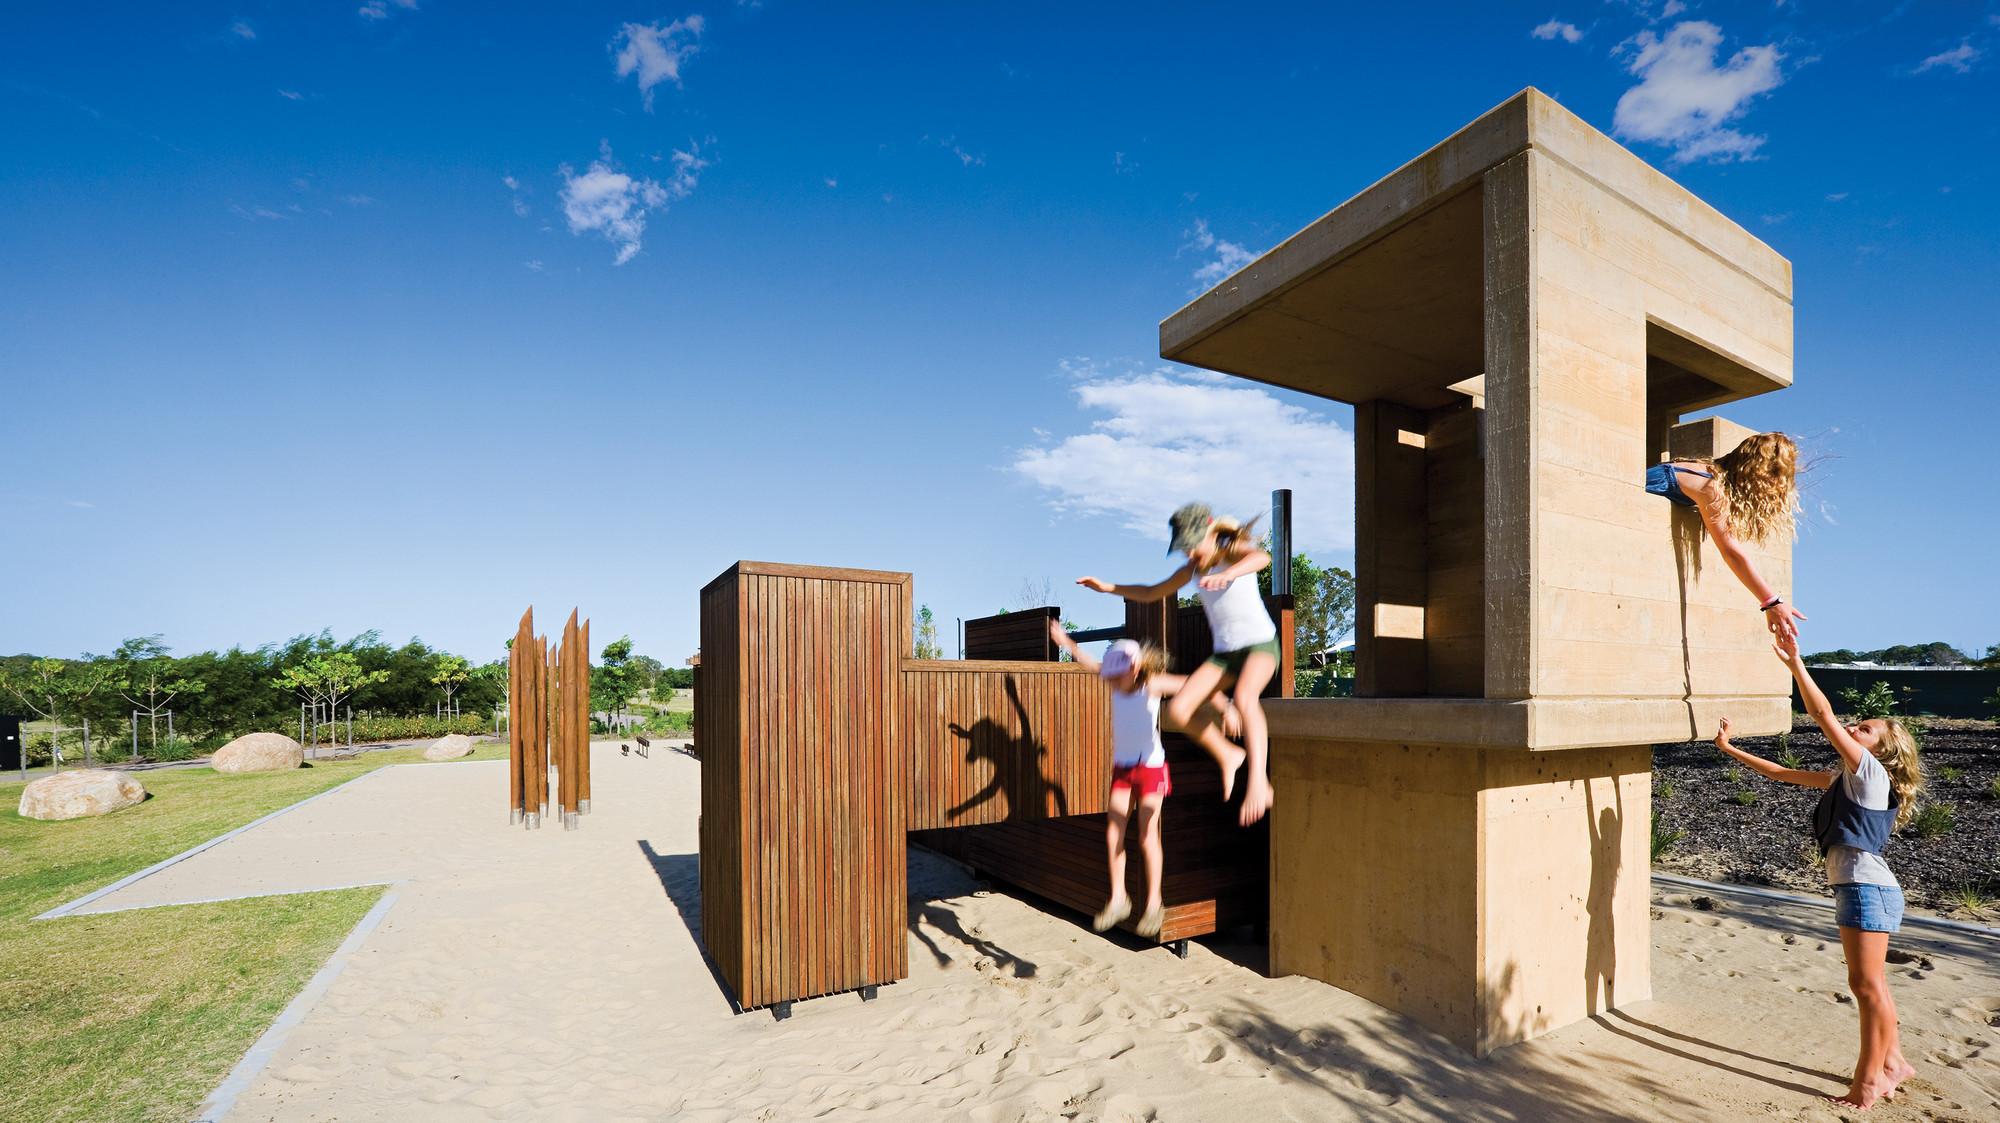 Gallery Of Elysium Playground Cox Rayner Architects 6